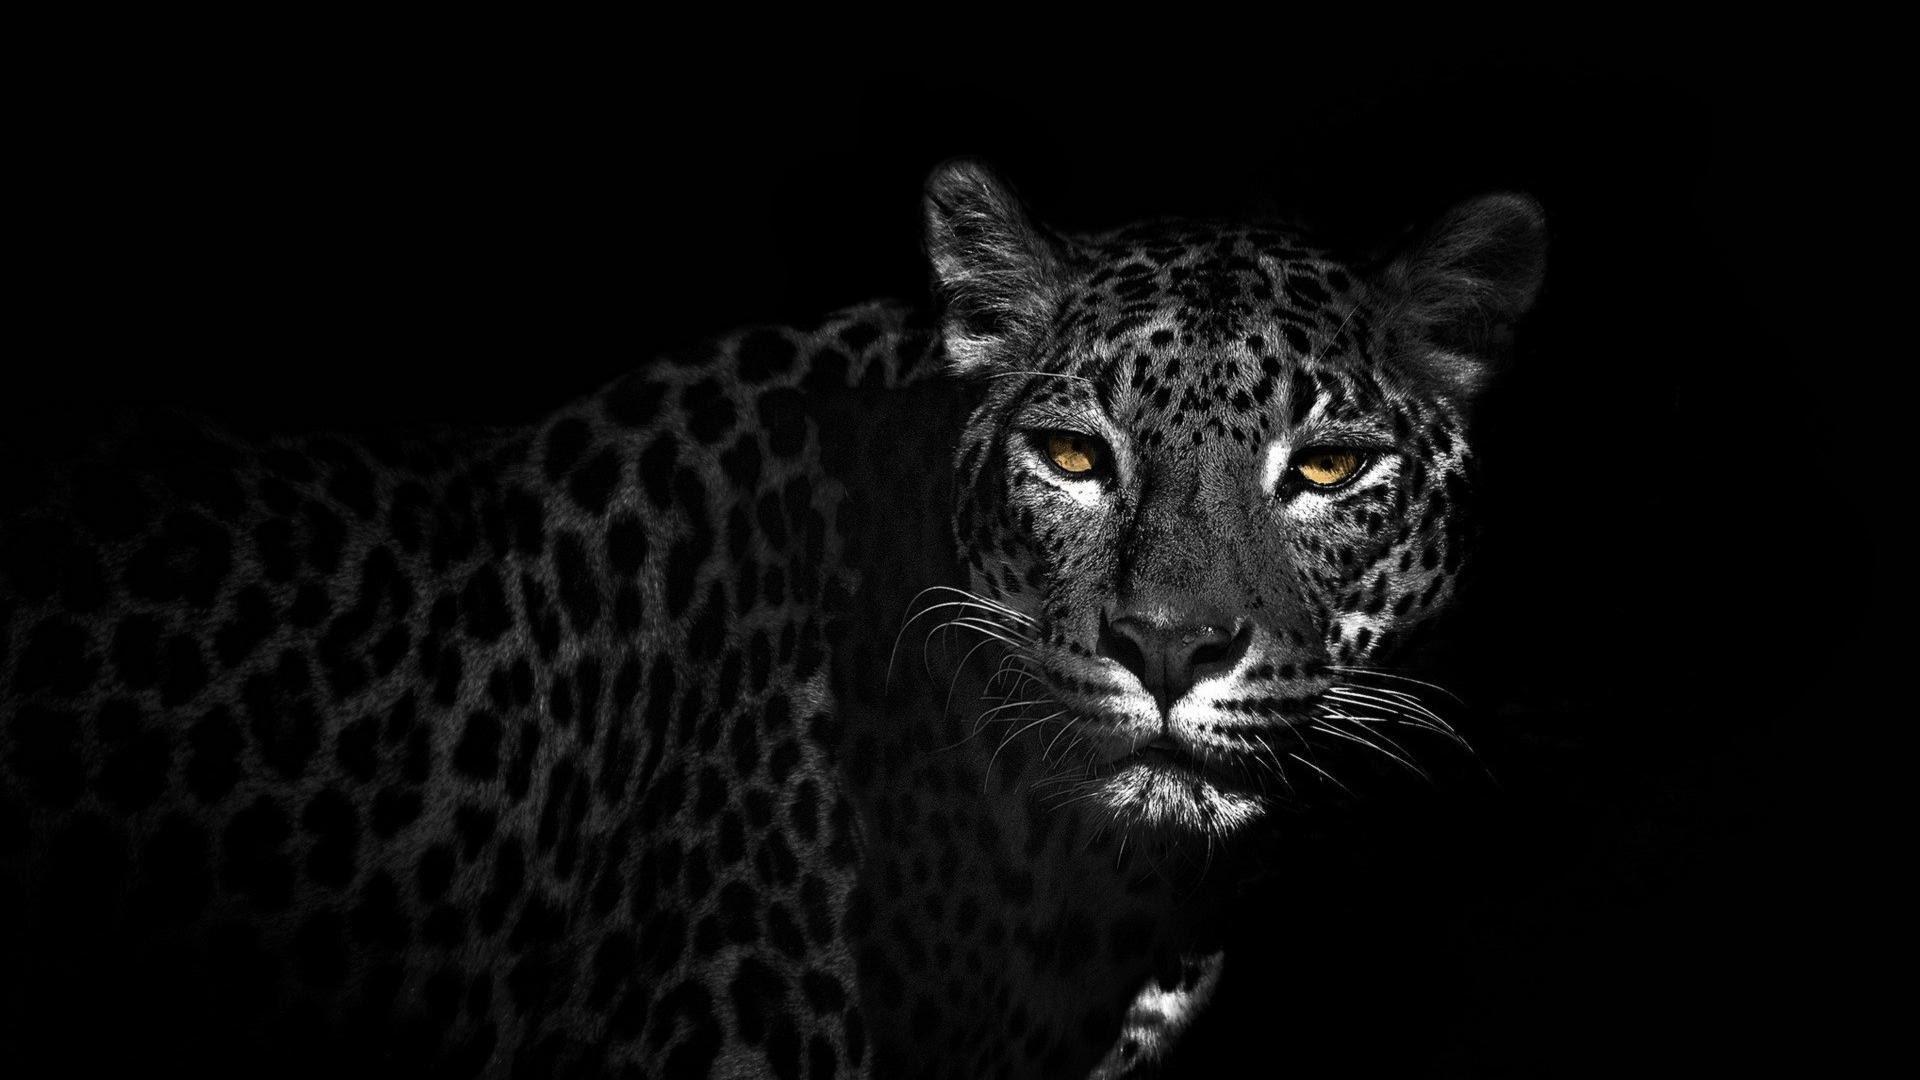 Black Jaguar Wallpaper 4k Artistic Joyful